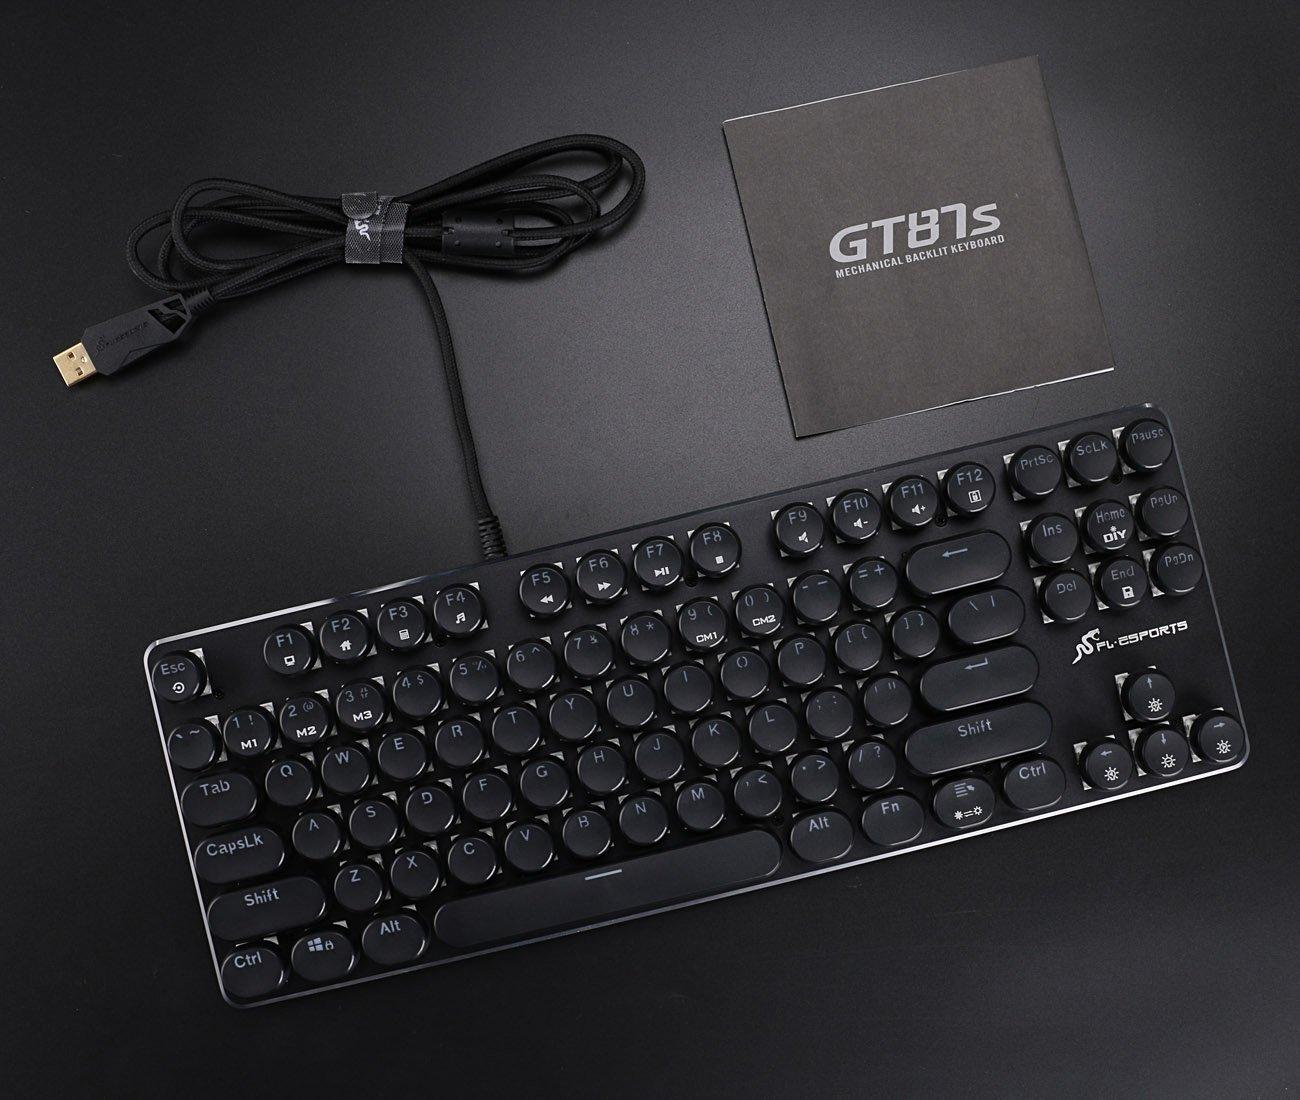 Amazon.com: Keyboard Retro Keyboard 87 Keys Keyboard with White LED Backlit Keyboard Typewriter Retro Style Keyboard Metal Base and Round Keycaps Anti ...